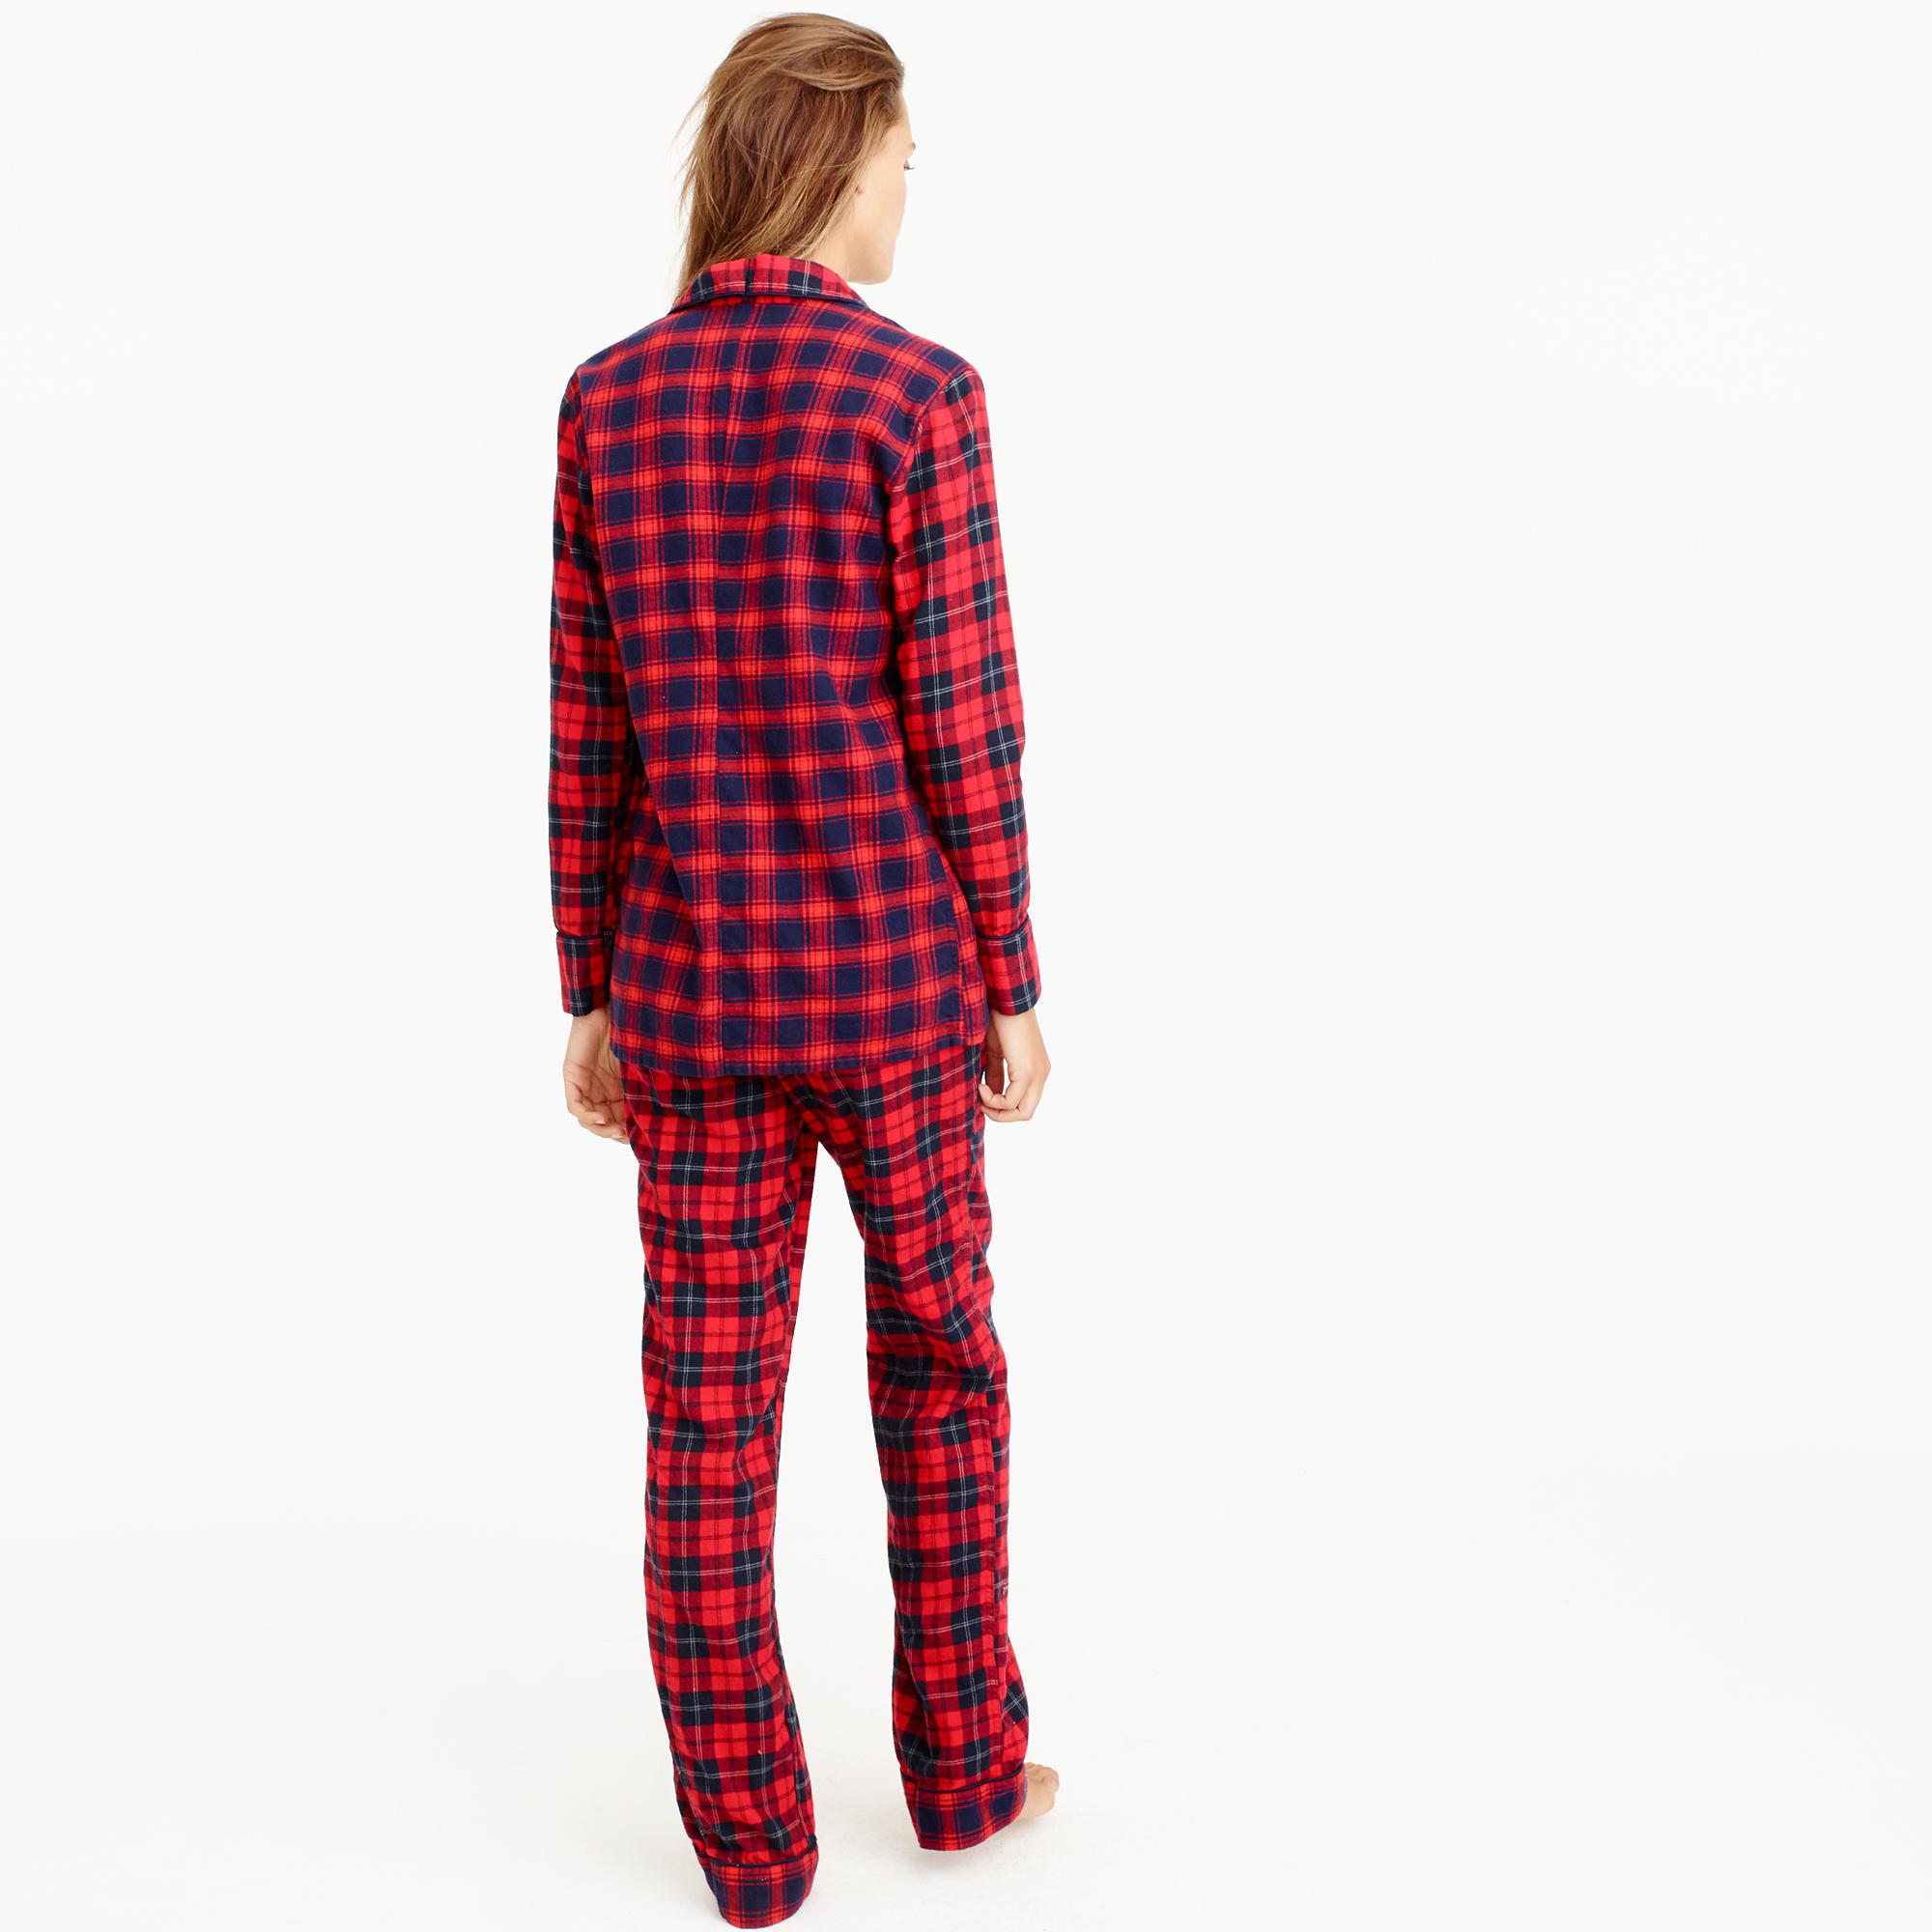 Mixed Plaid Flannel Pajama Set : Women's Pajamas & Sleepwear   J.Crew